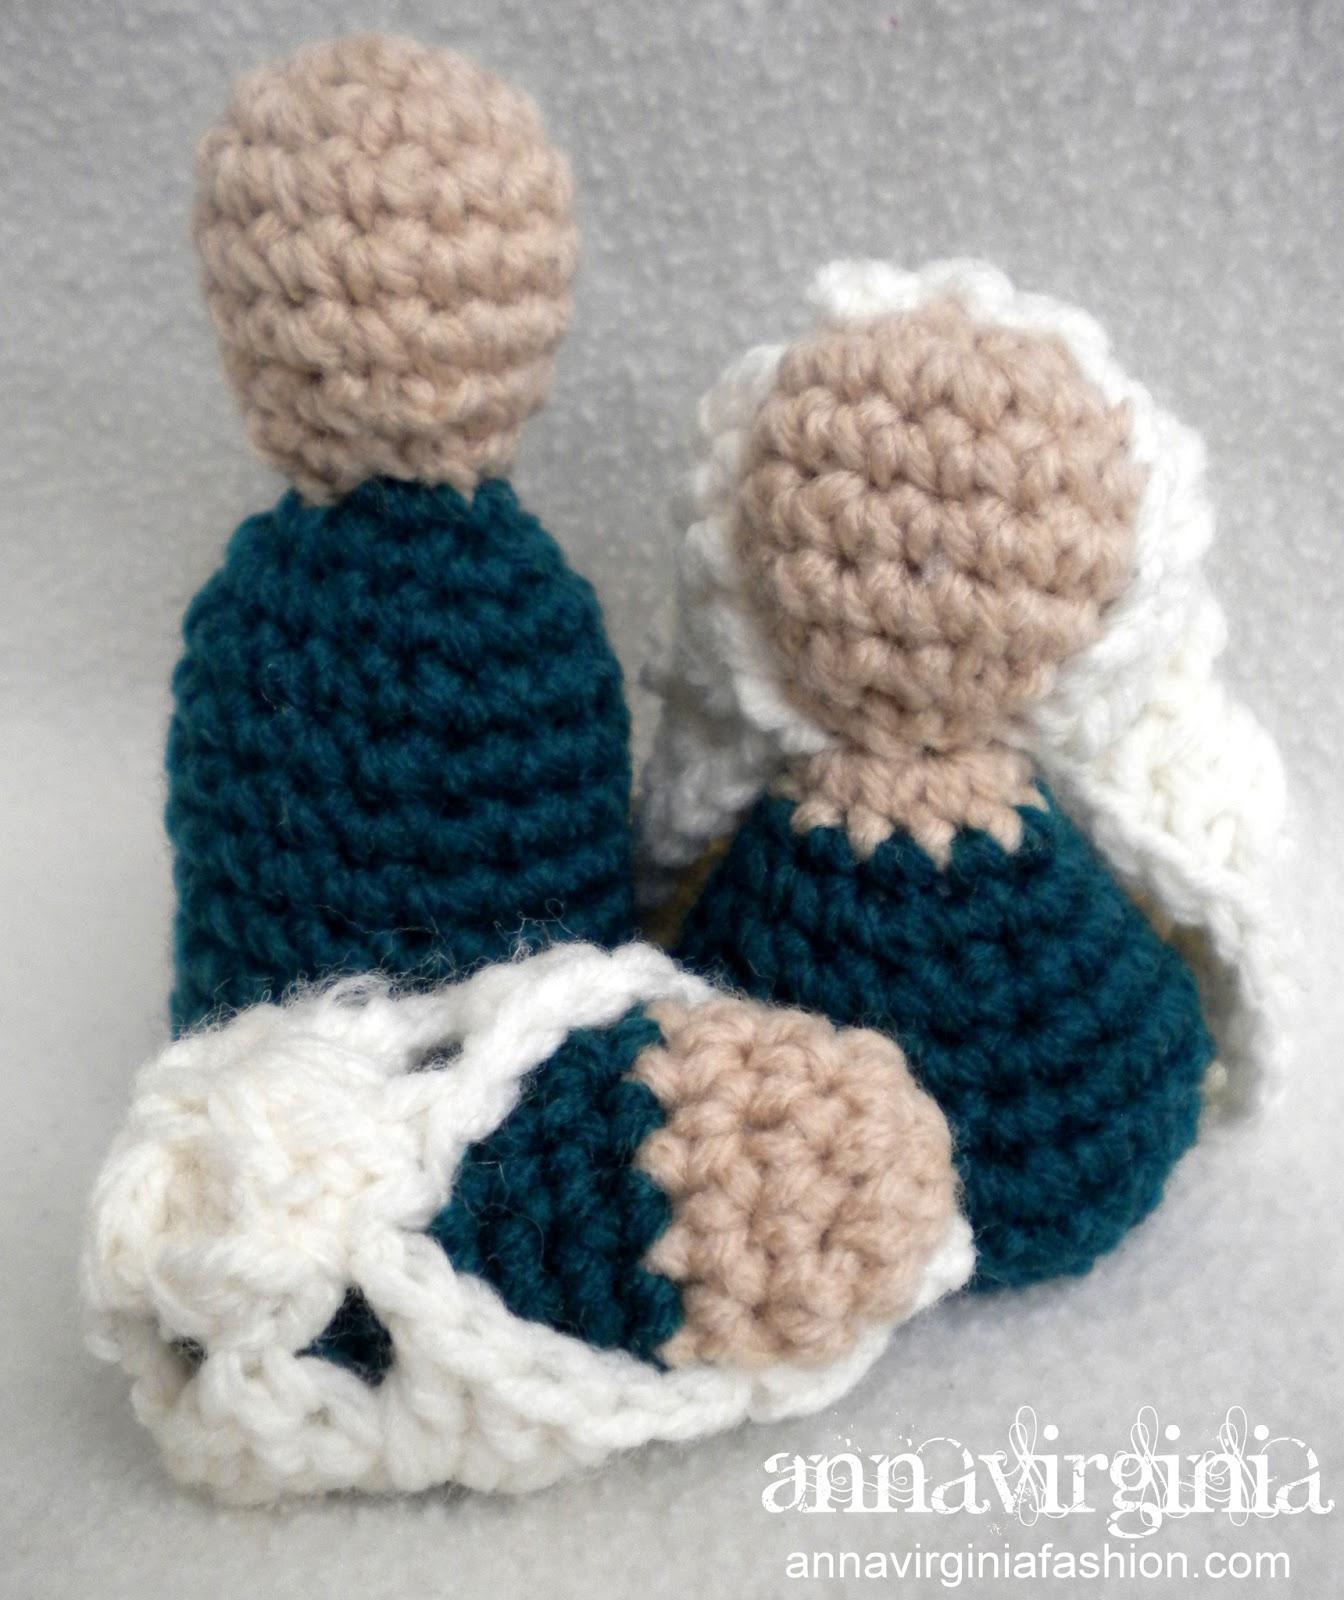 Crochet Patterns Nativity Scene : Crochet Nativity